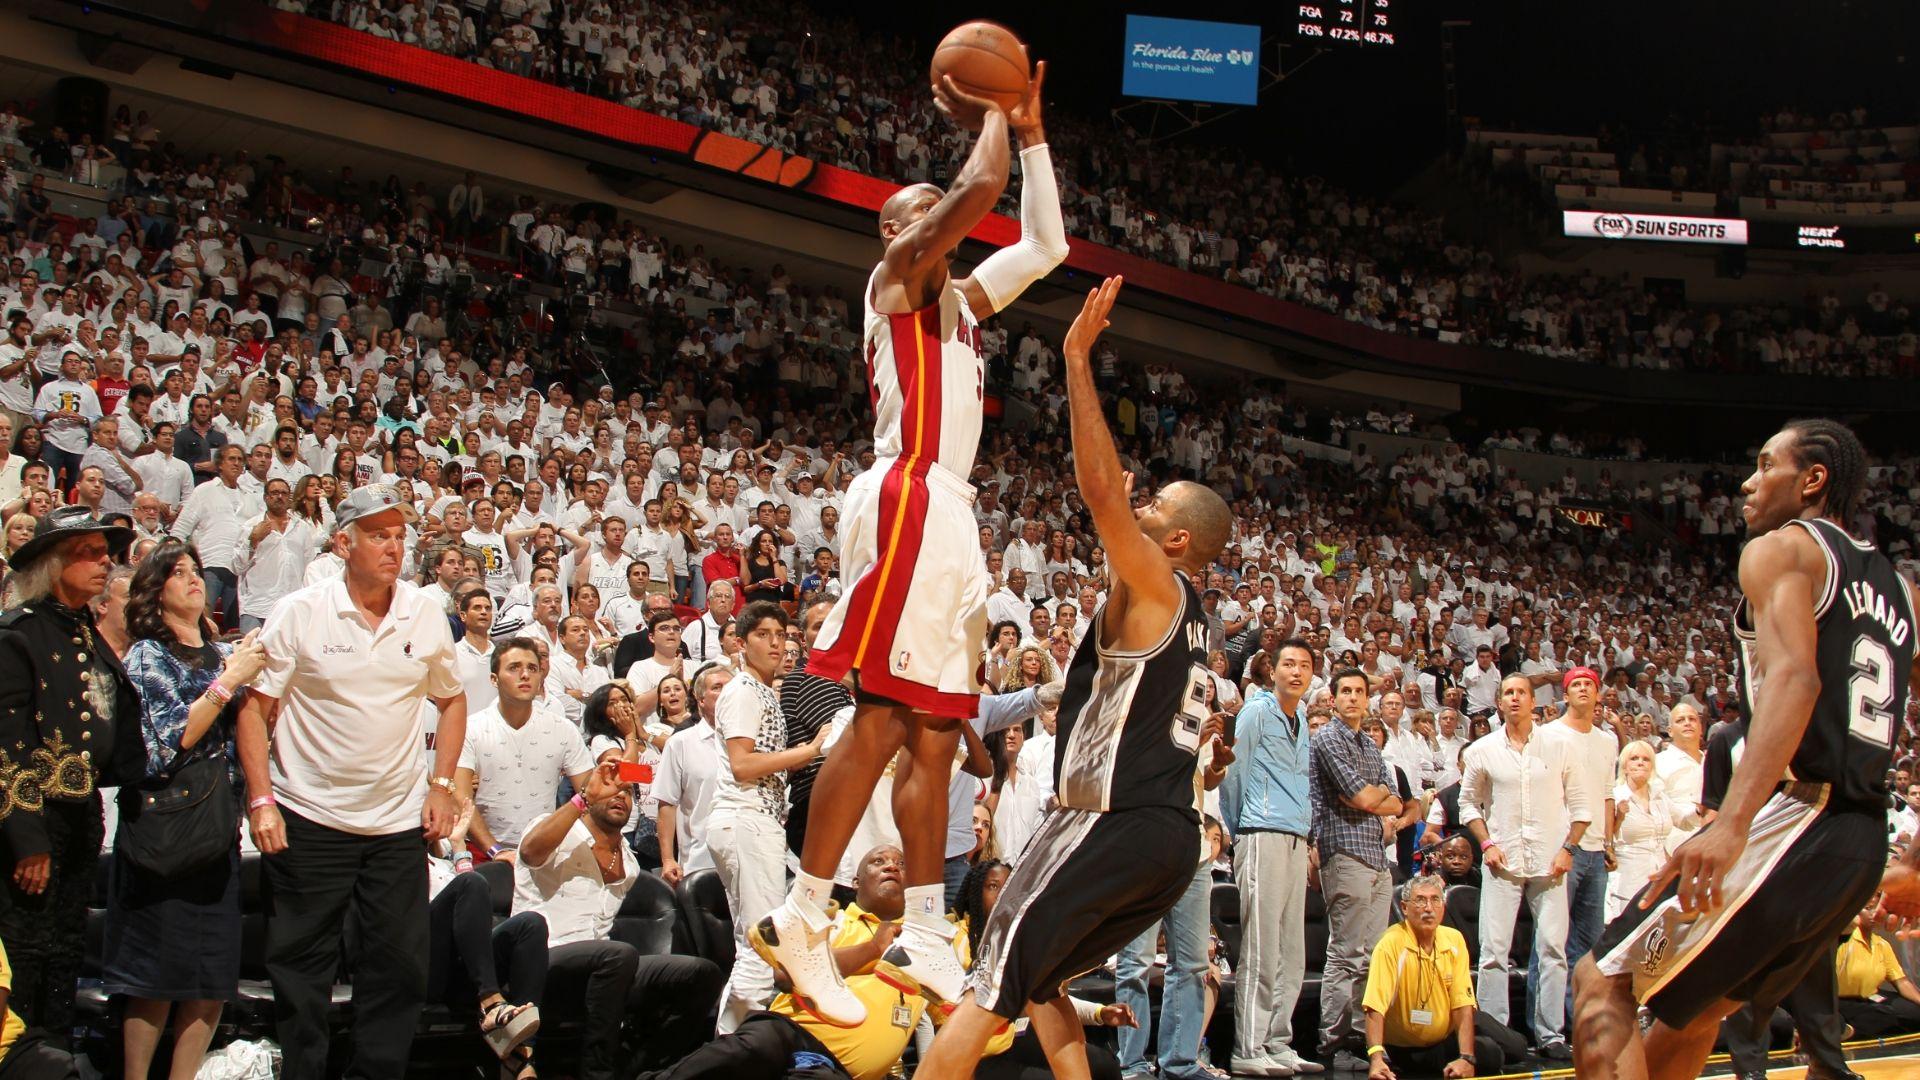 Ray Allen's clutch three for Heat in Game 6 - ESPN Video